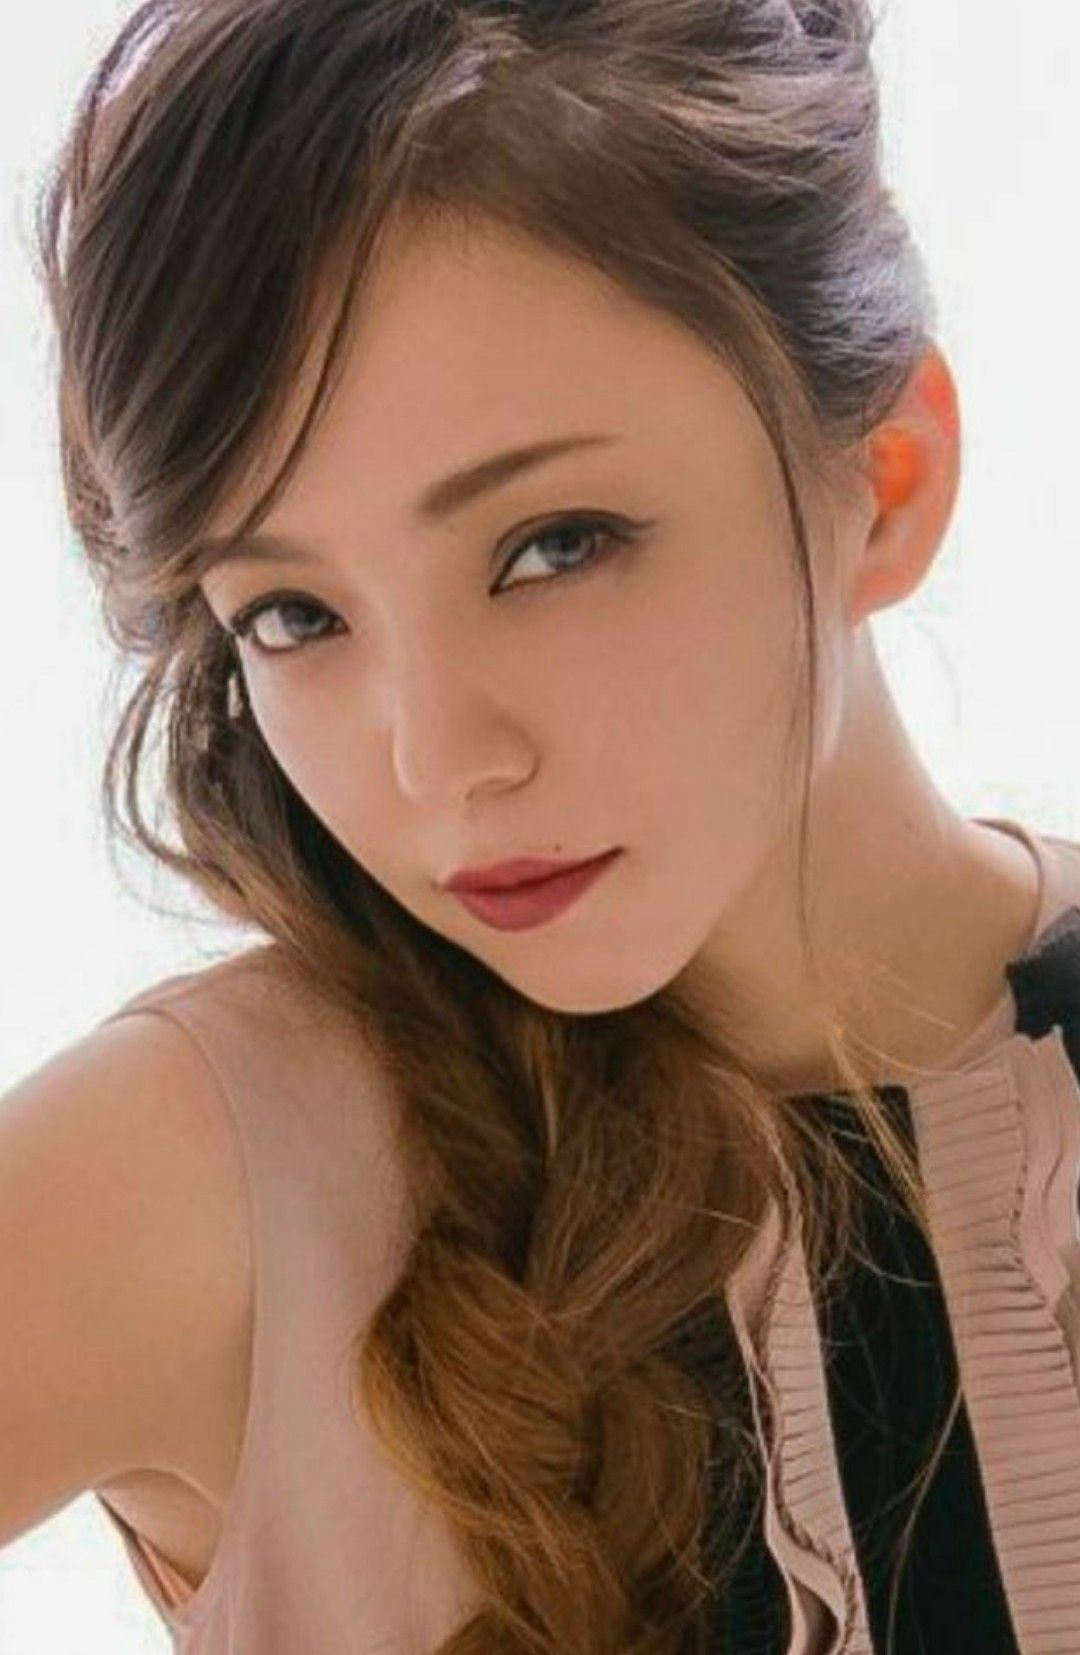 安室奈美恵 Namie Amuro Beautiful Asian Women